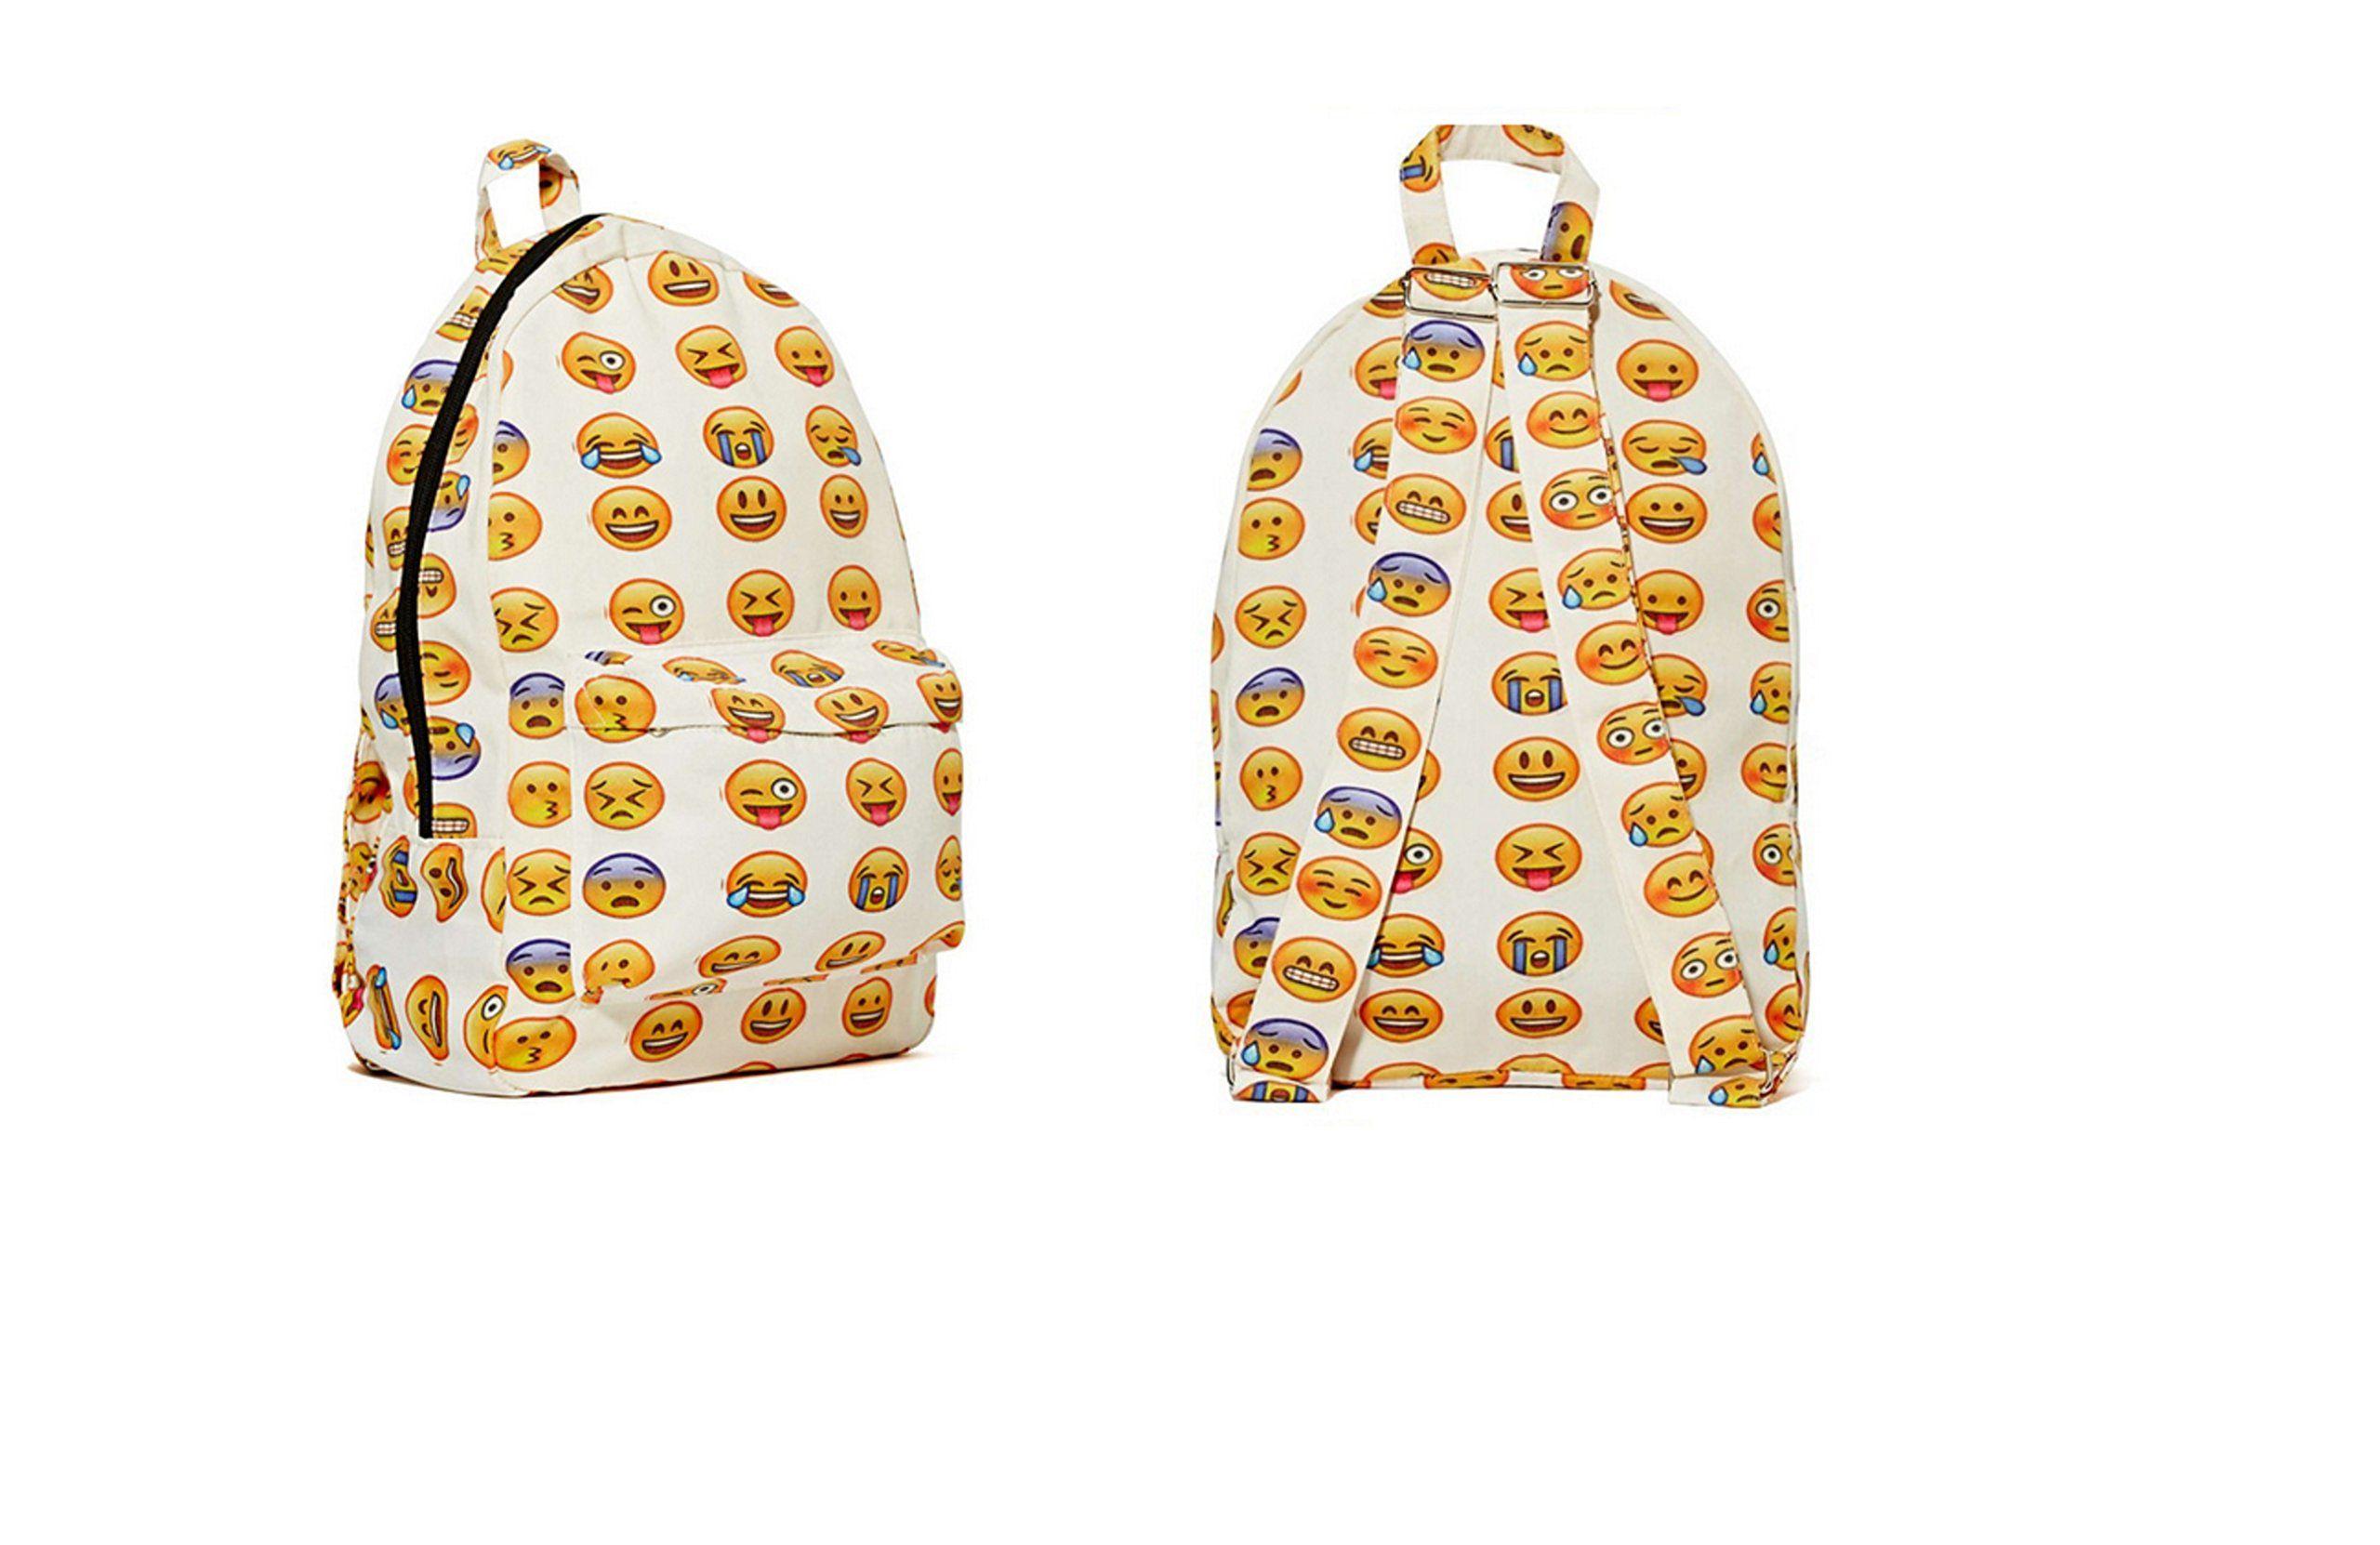 DESIGN super tendance trendy amis! sac de voyage sac à dos sac à dos imprimé smiley + sac mode fashion jutebeutel hipster bagpack emoji-unique!